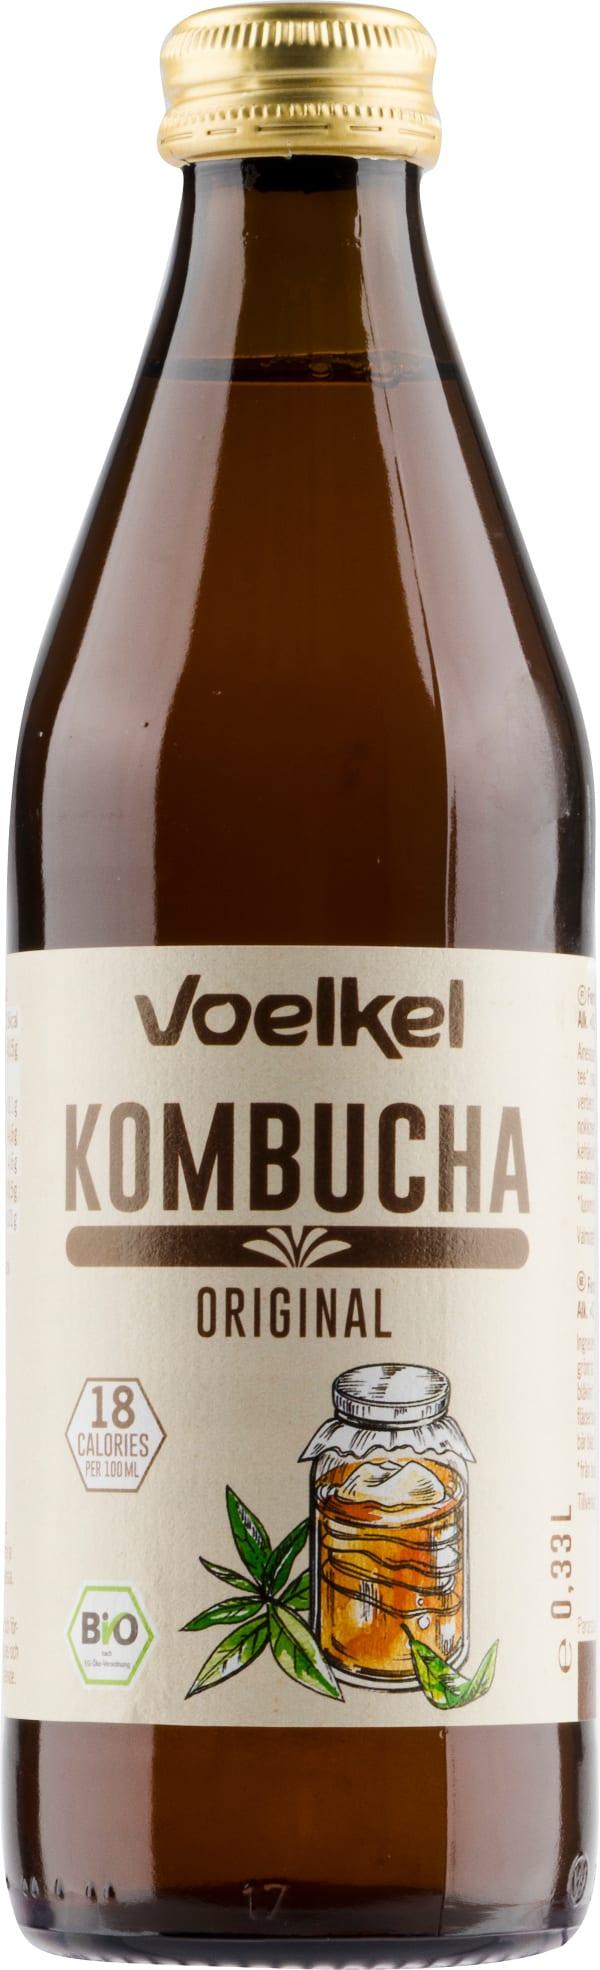 Voelkel Kombucha Original